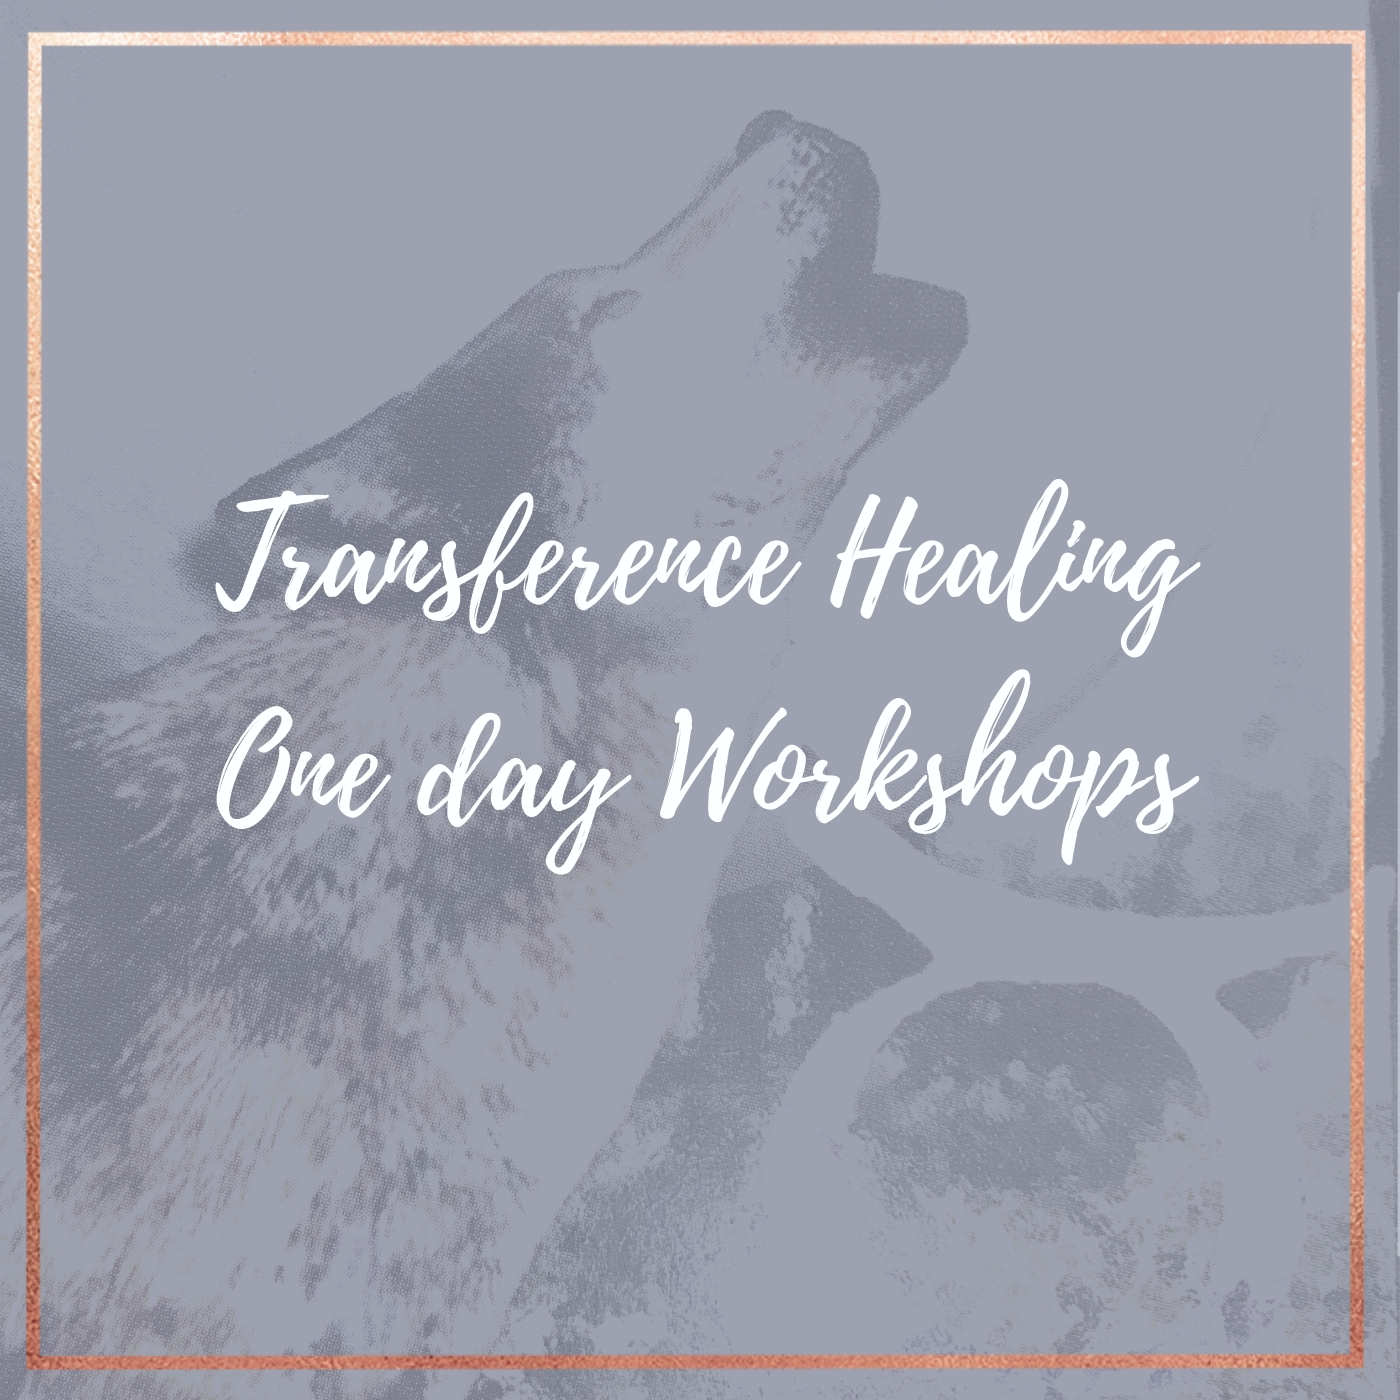 TH one day workshops copy 3.jpg